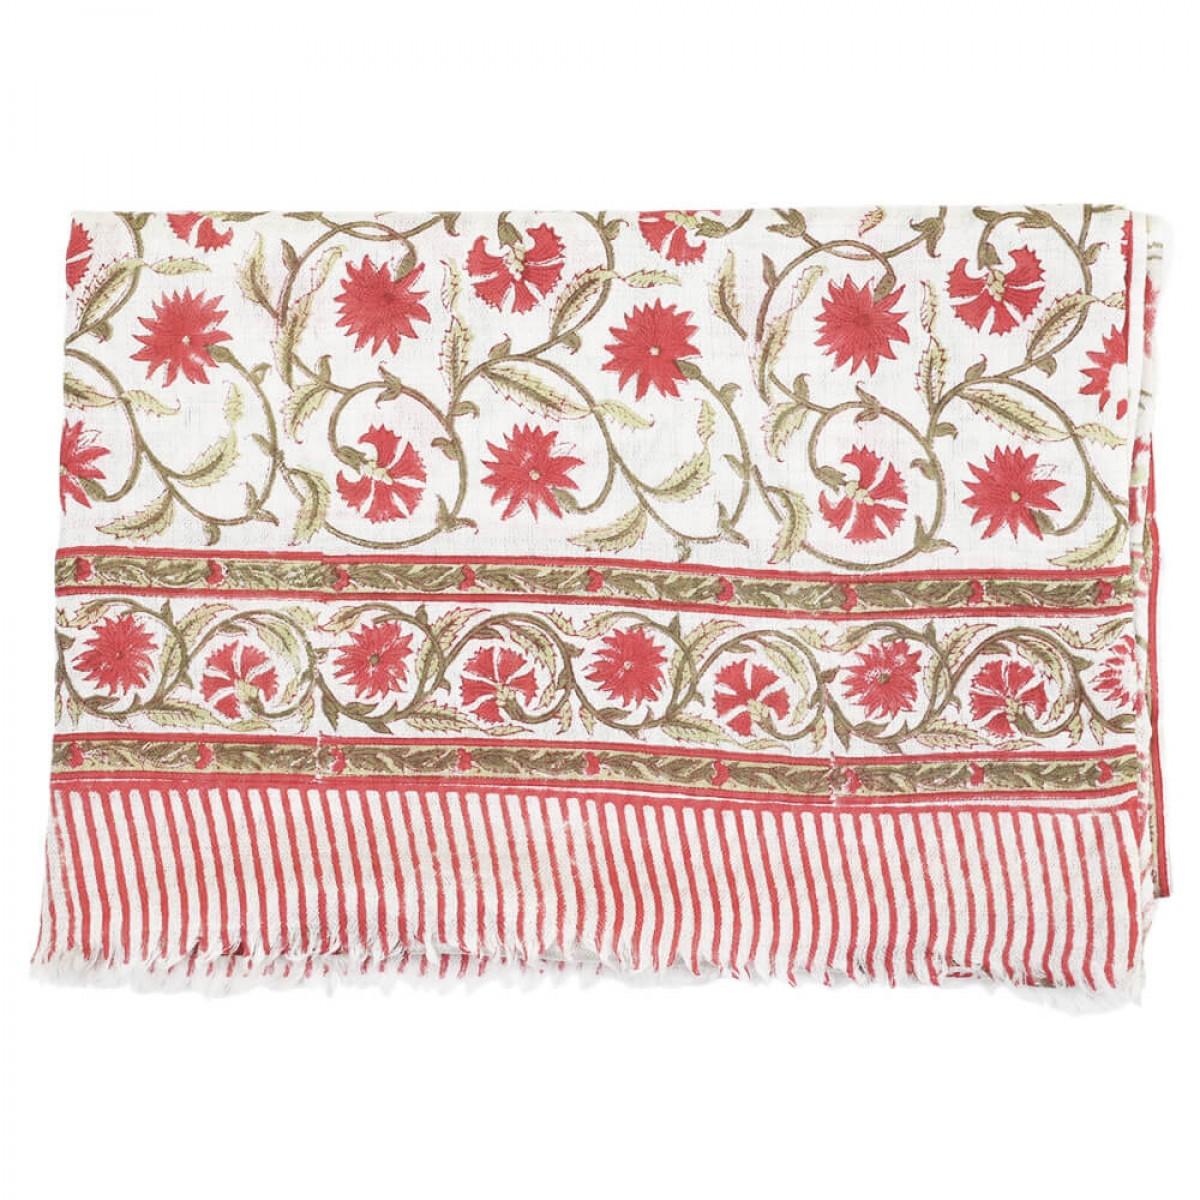 Block Printed Woolen Shawl - Apple Red